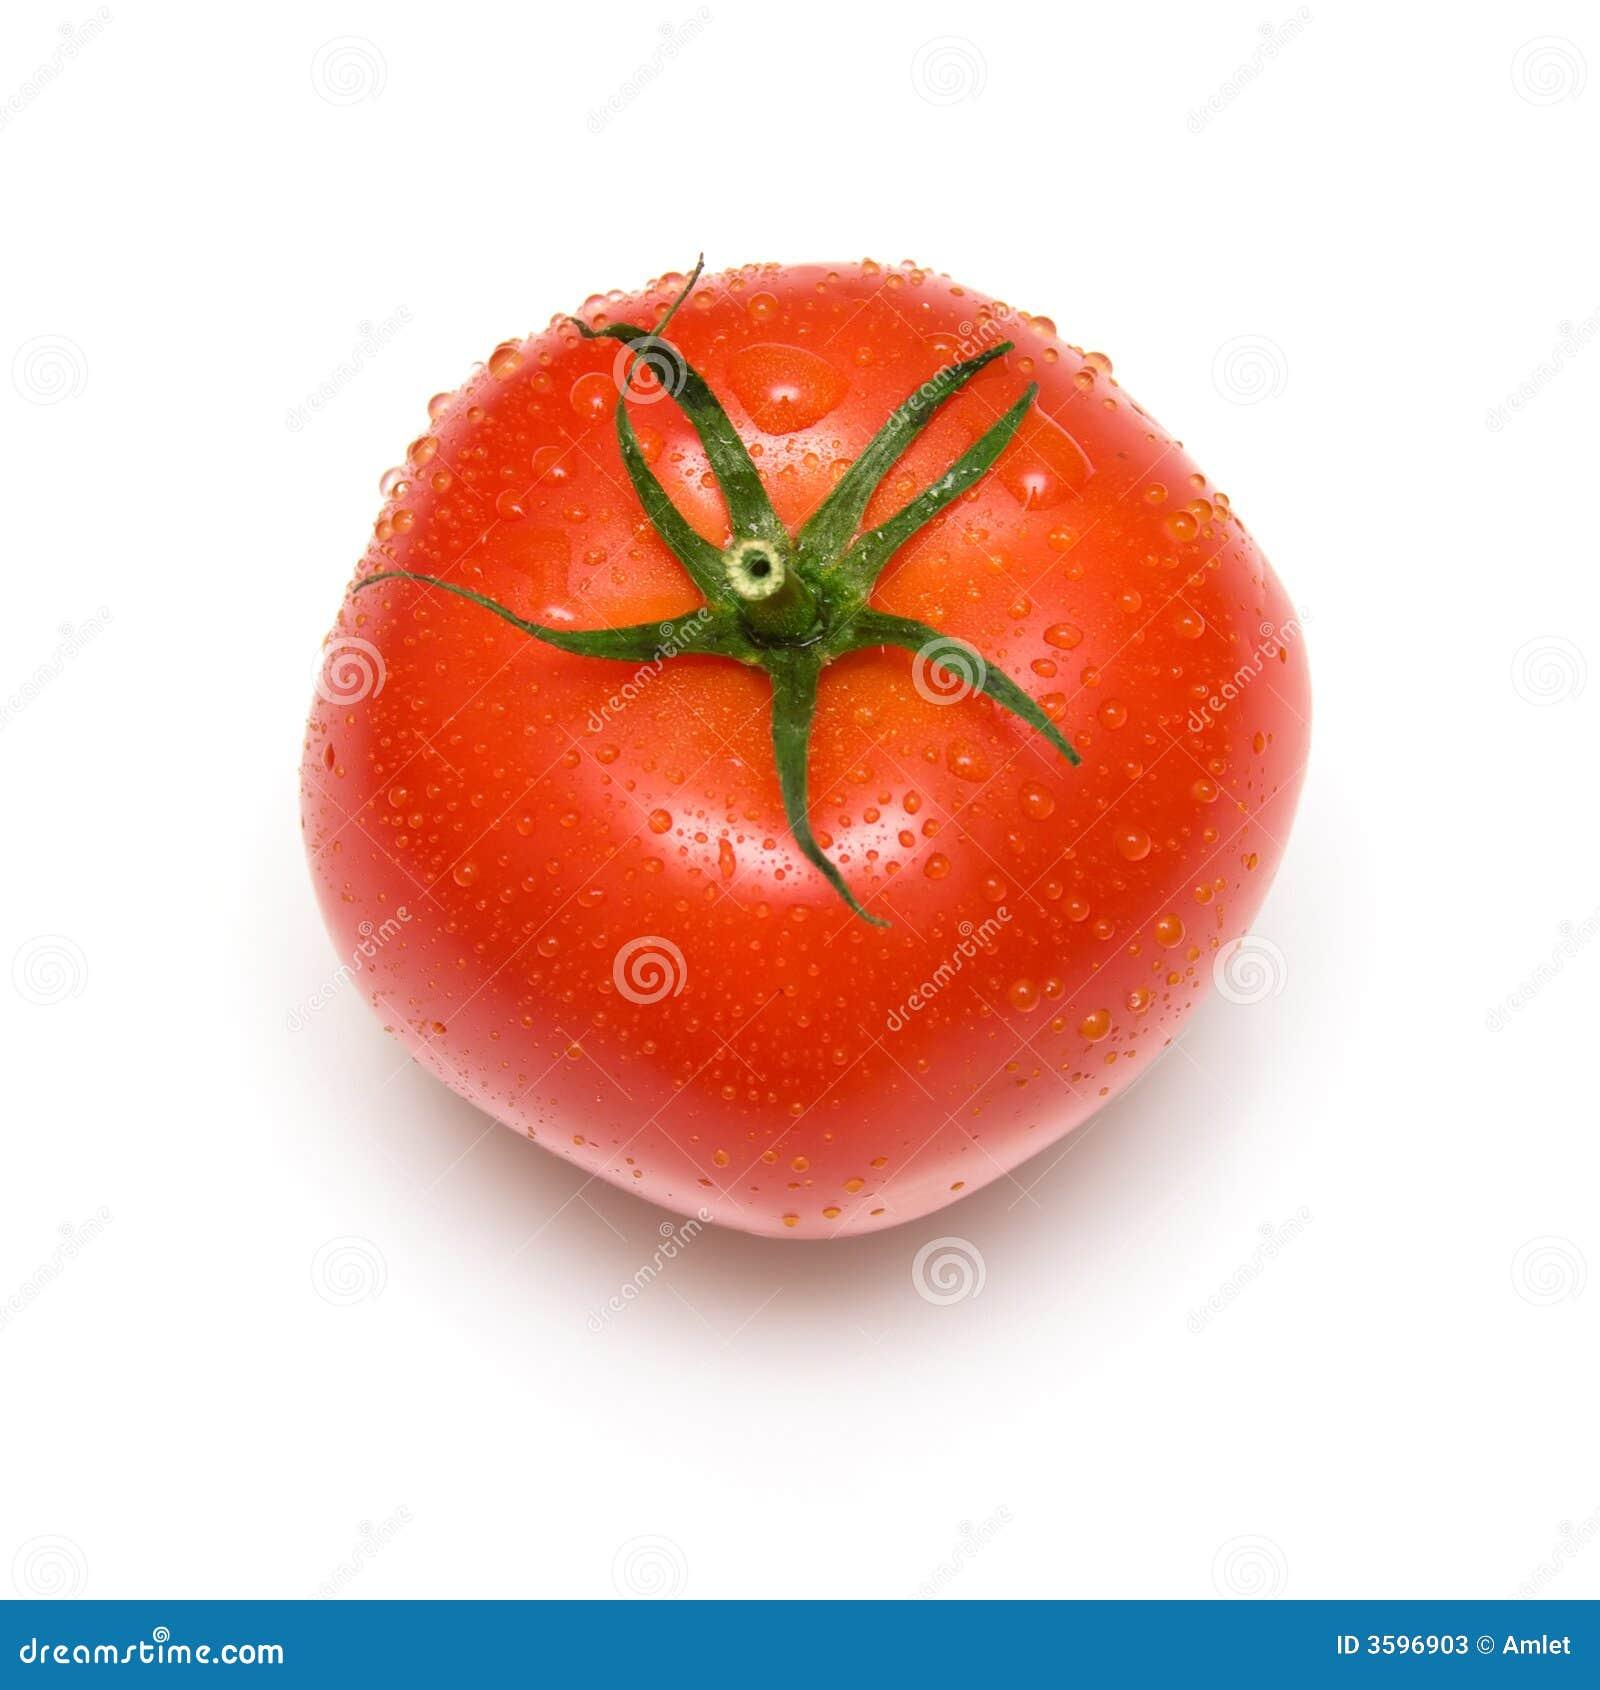 Great tomato